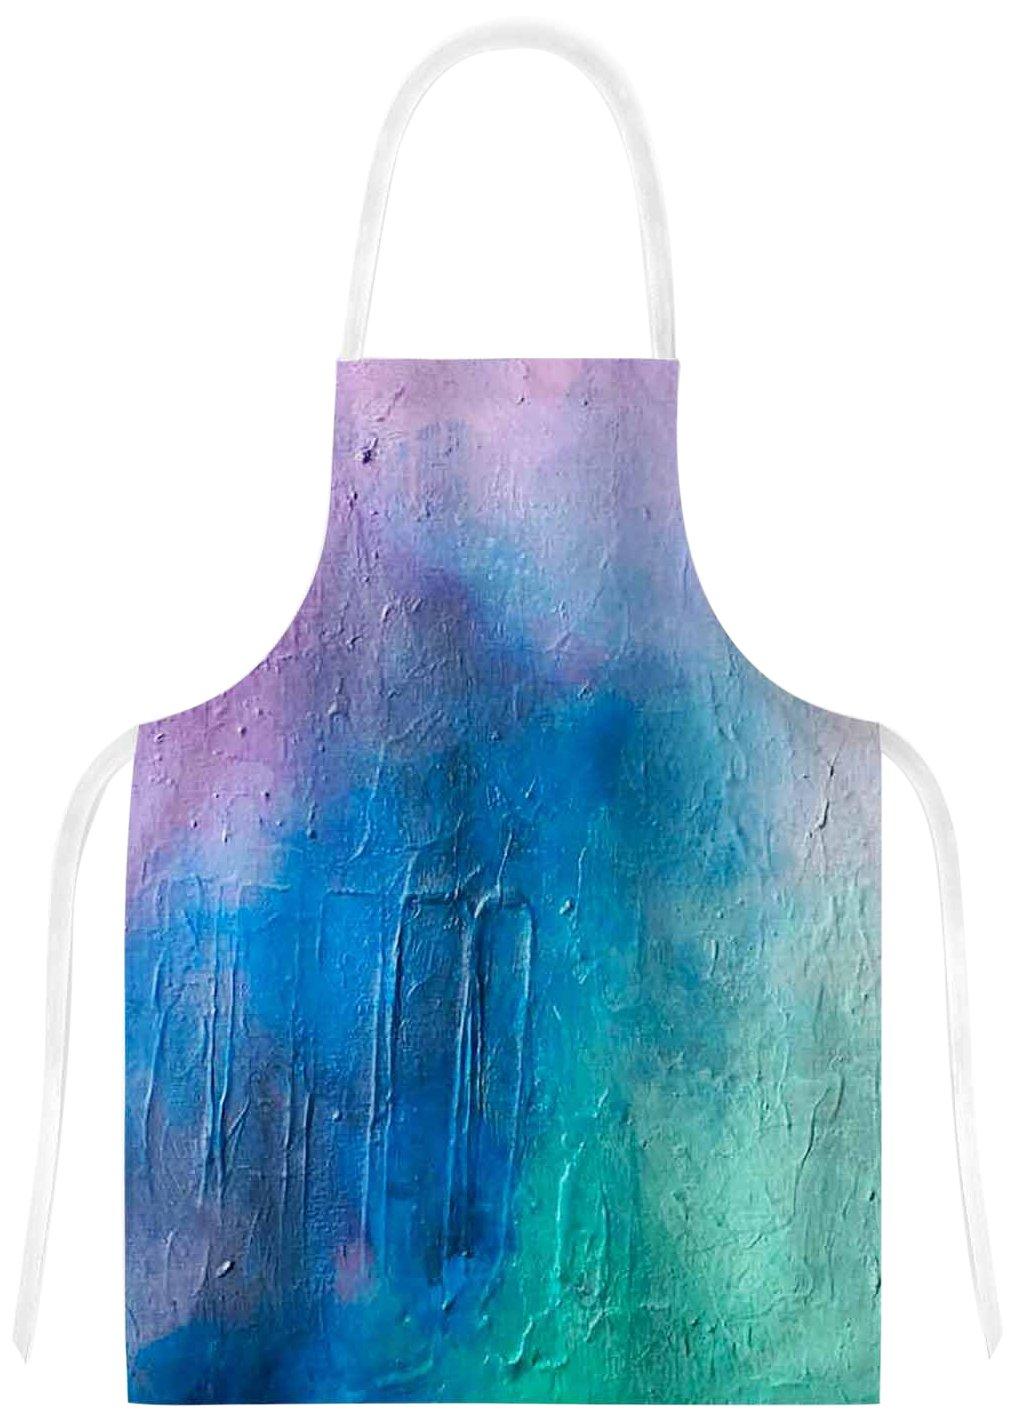 KESS InHouse GF2022AAR01 Geordanna FieldsClarity Pink Blue Painting Artistic Apron Multicolor 31 x 36